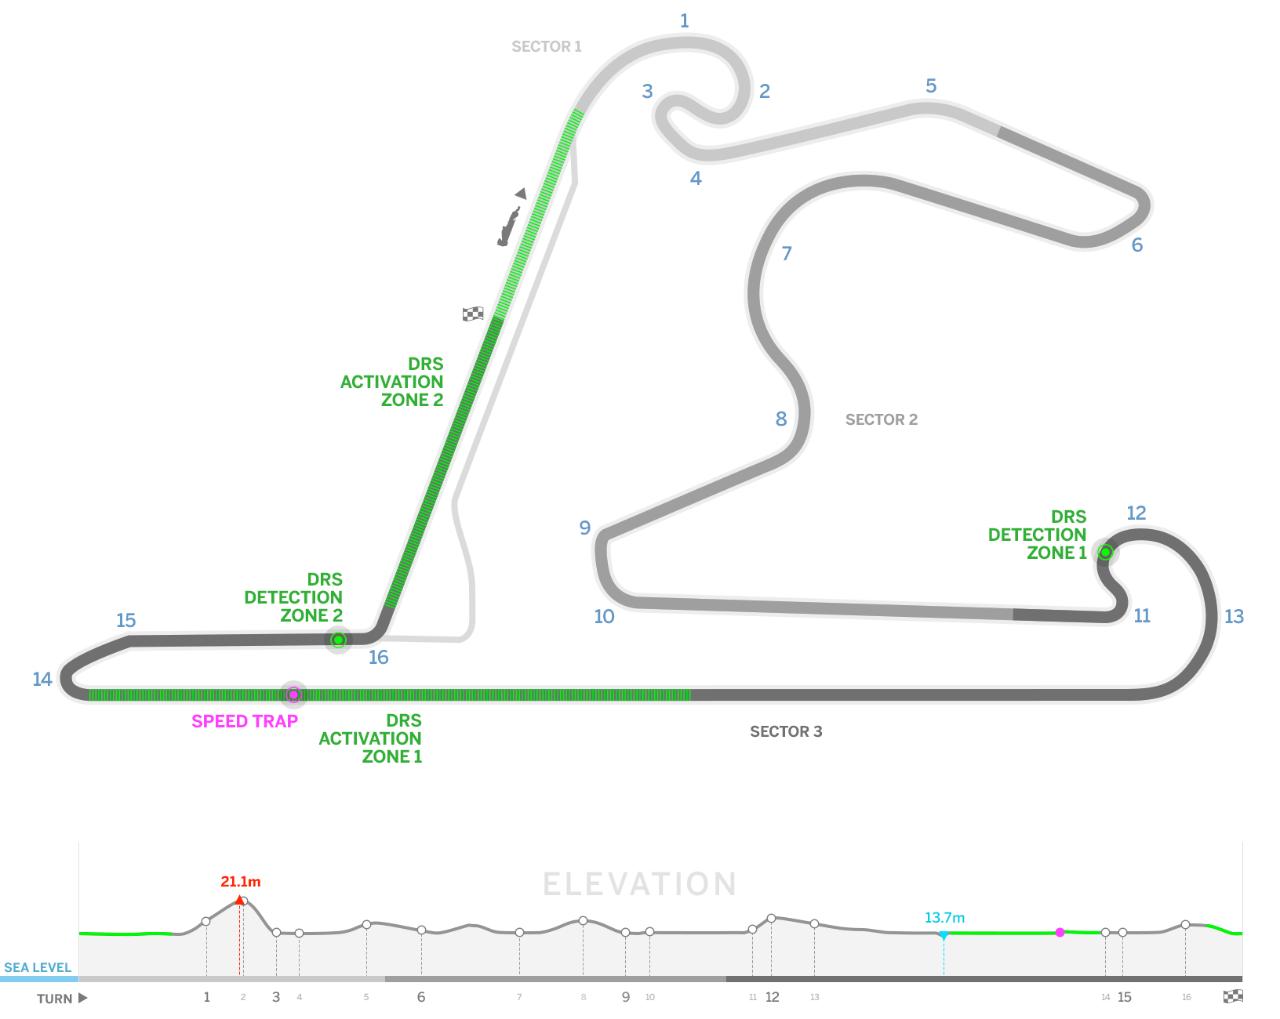 2799-F1-Experiences-Race-Map-China-d3e840ef50a238f119961186a9cbce2b.png